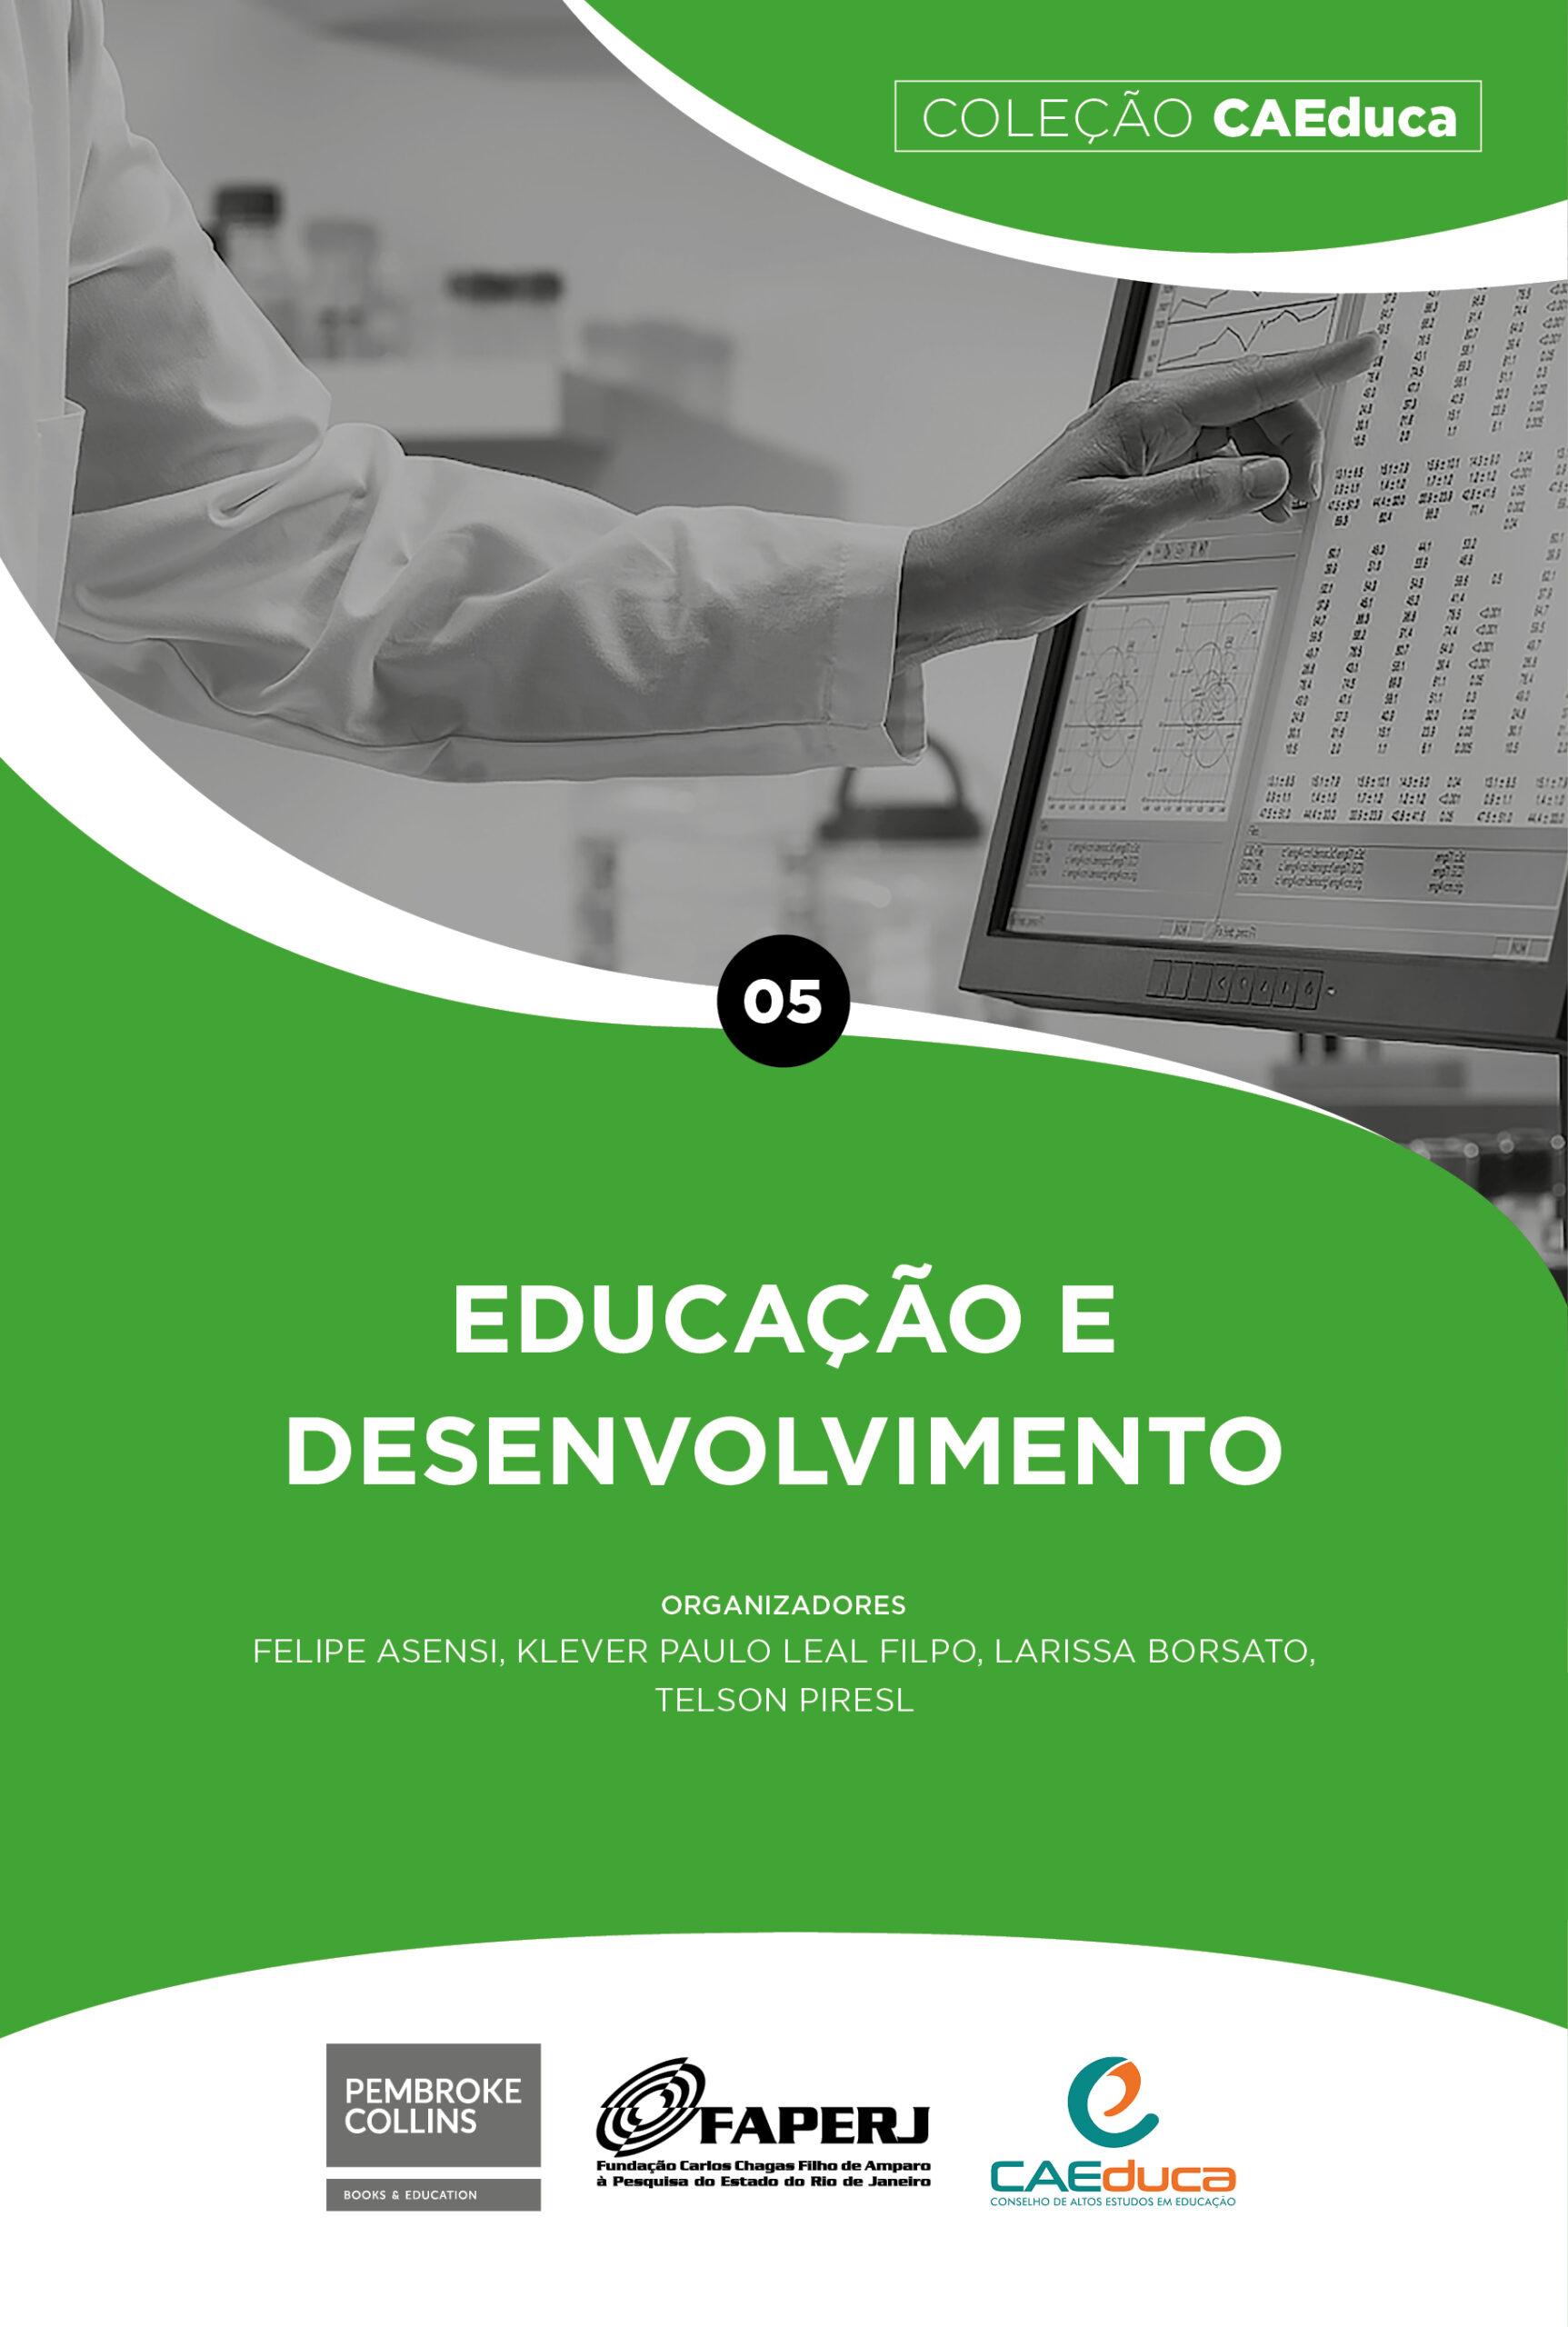 educacao-e-desenvolvimento-caeduca